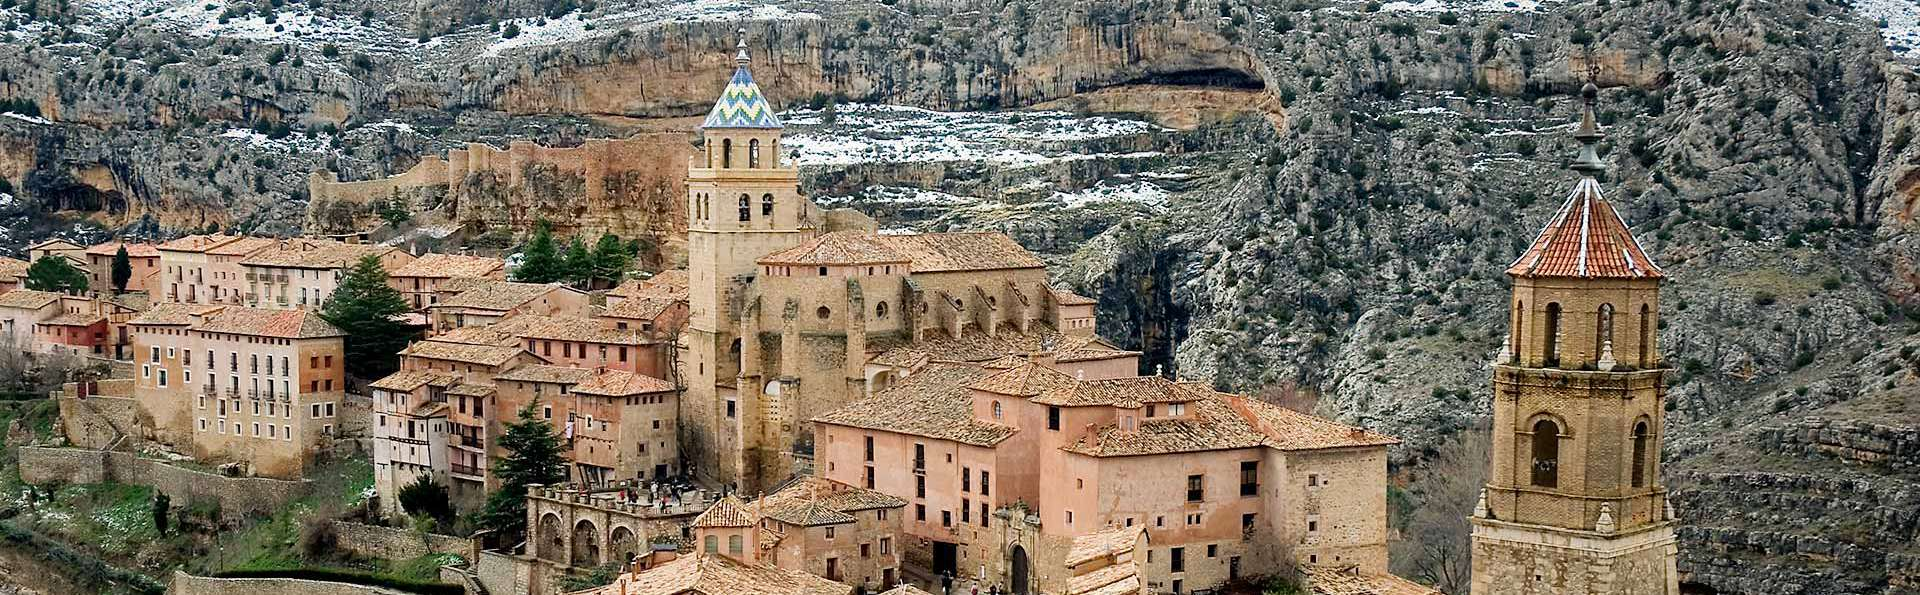 Hotel Albarracín - EDIT_DESTINATION_01.jpg